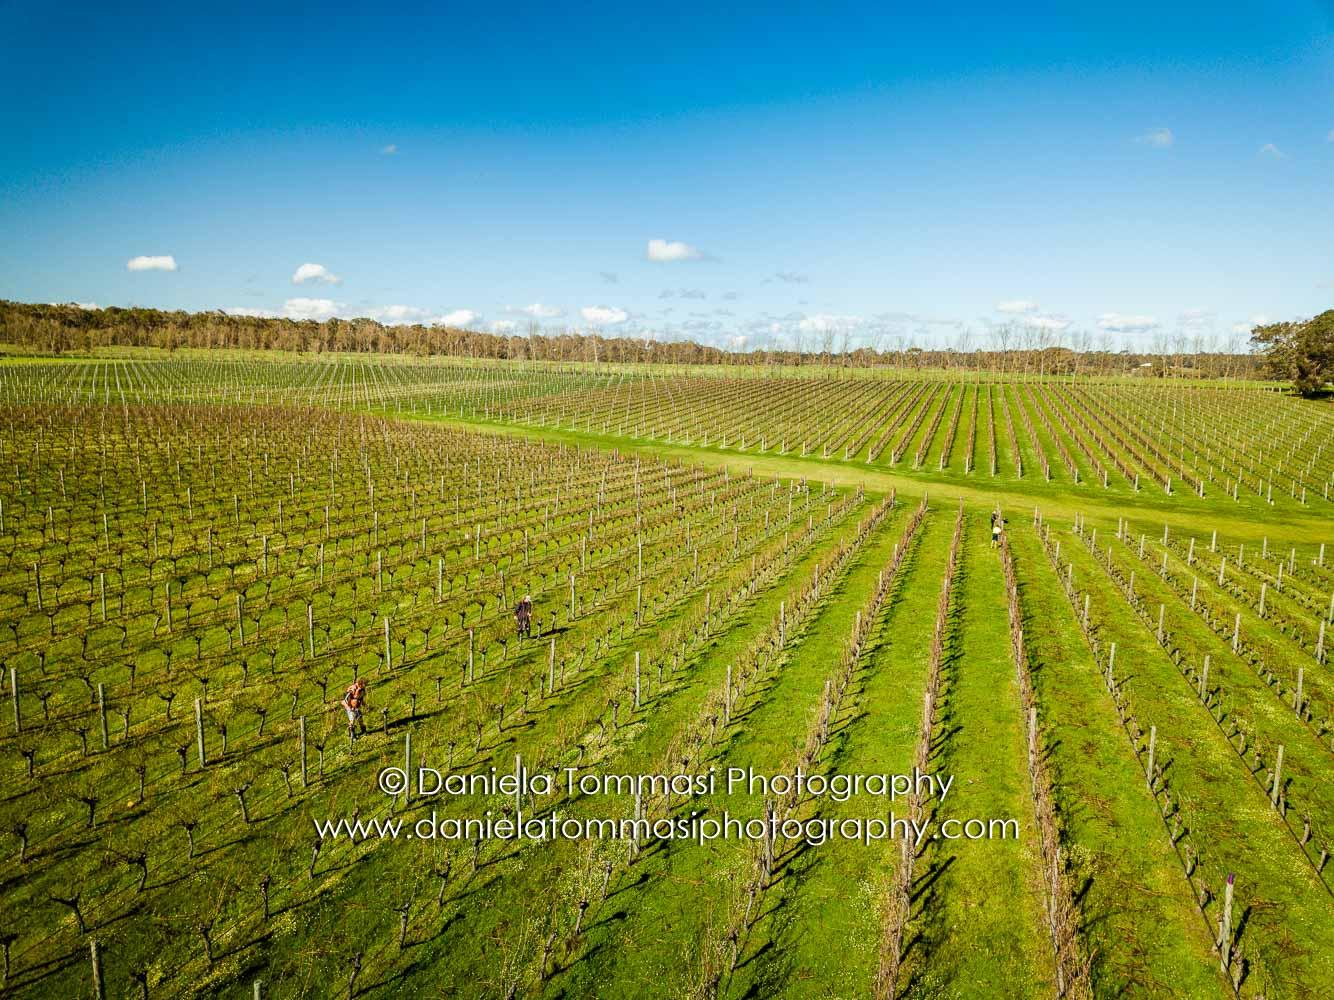 Winery-Daniela Tommasi Photography-6